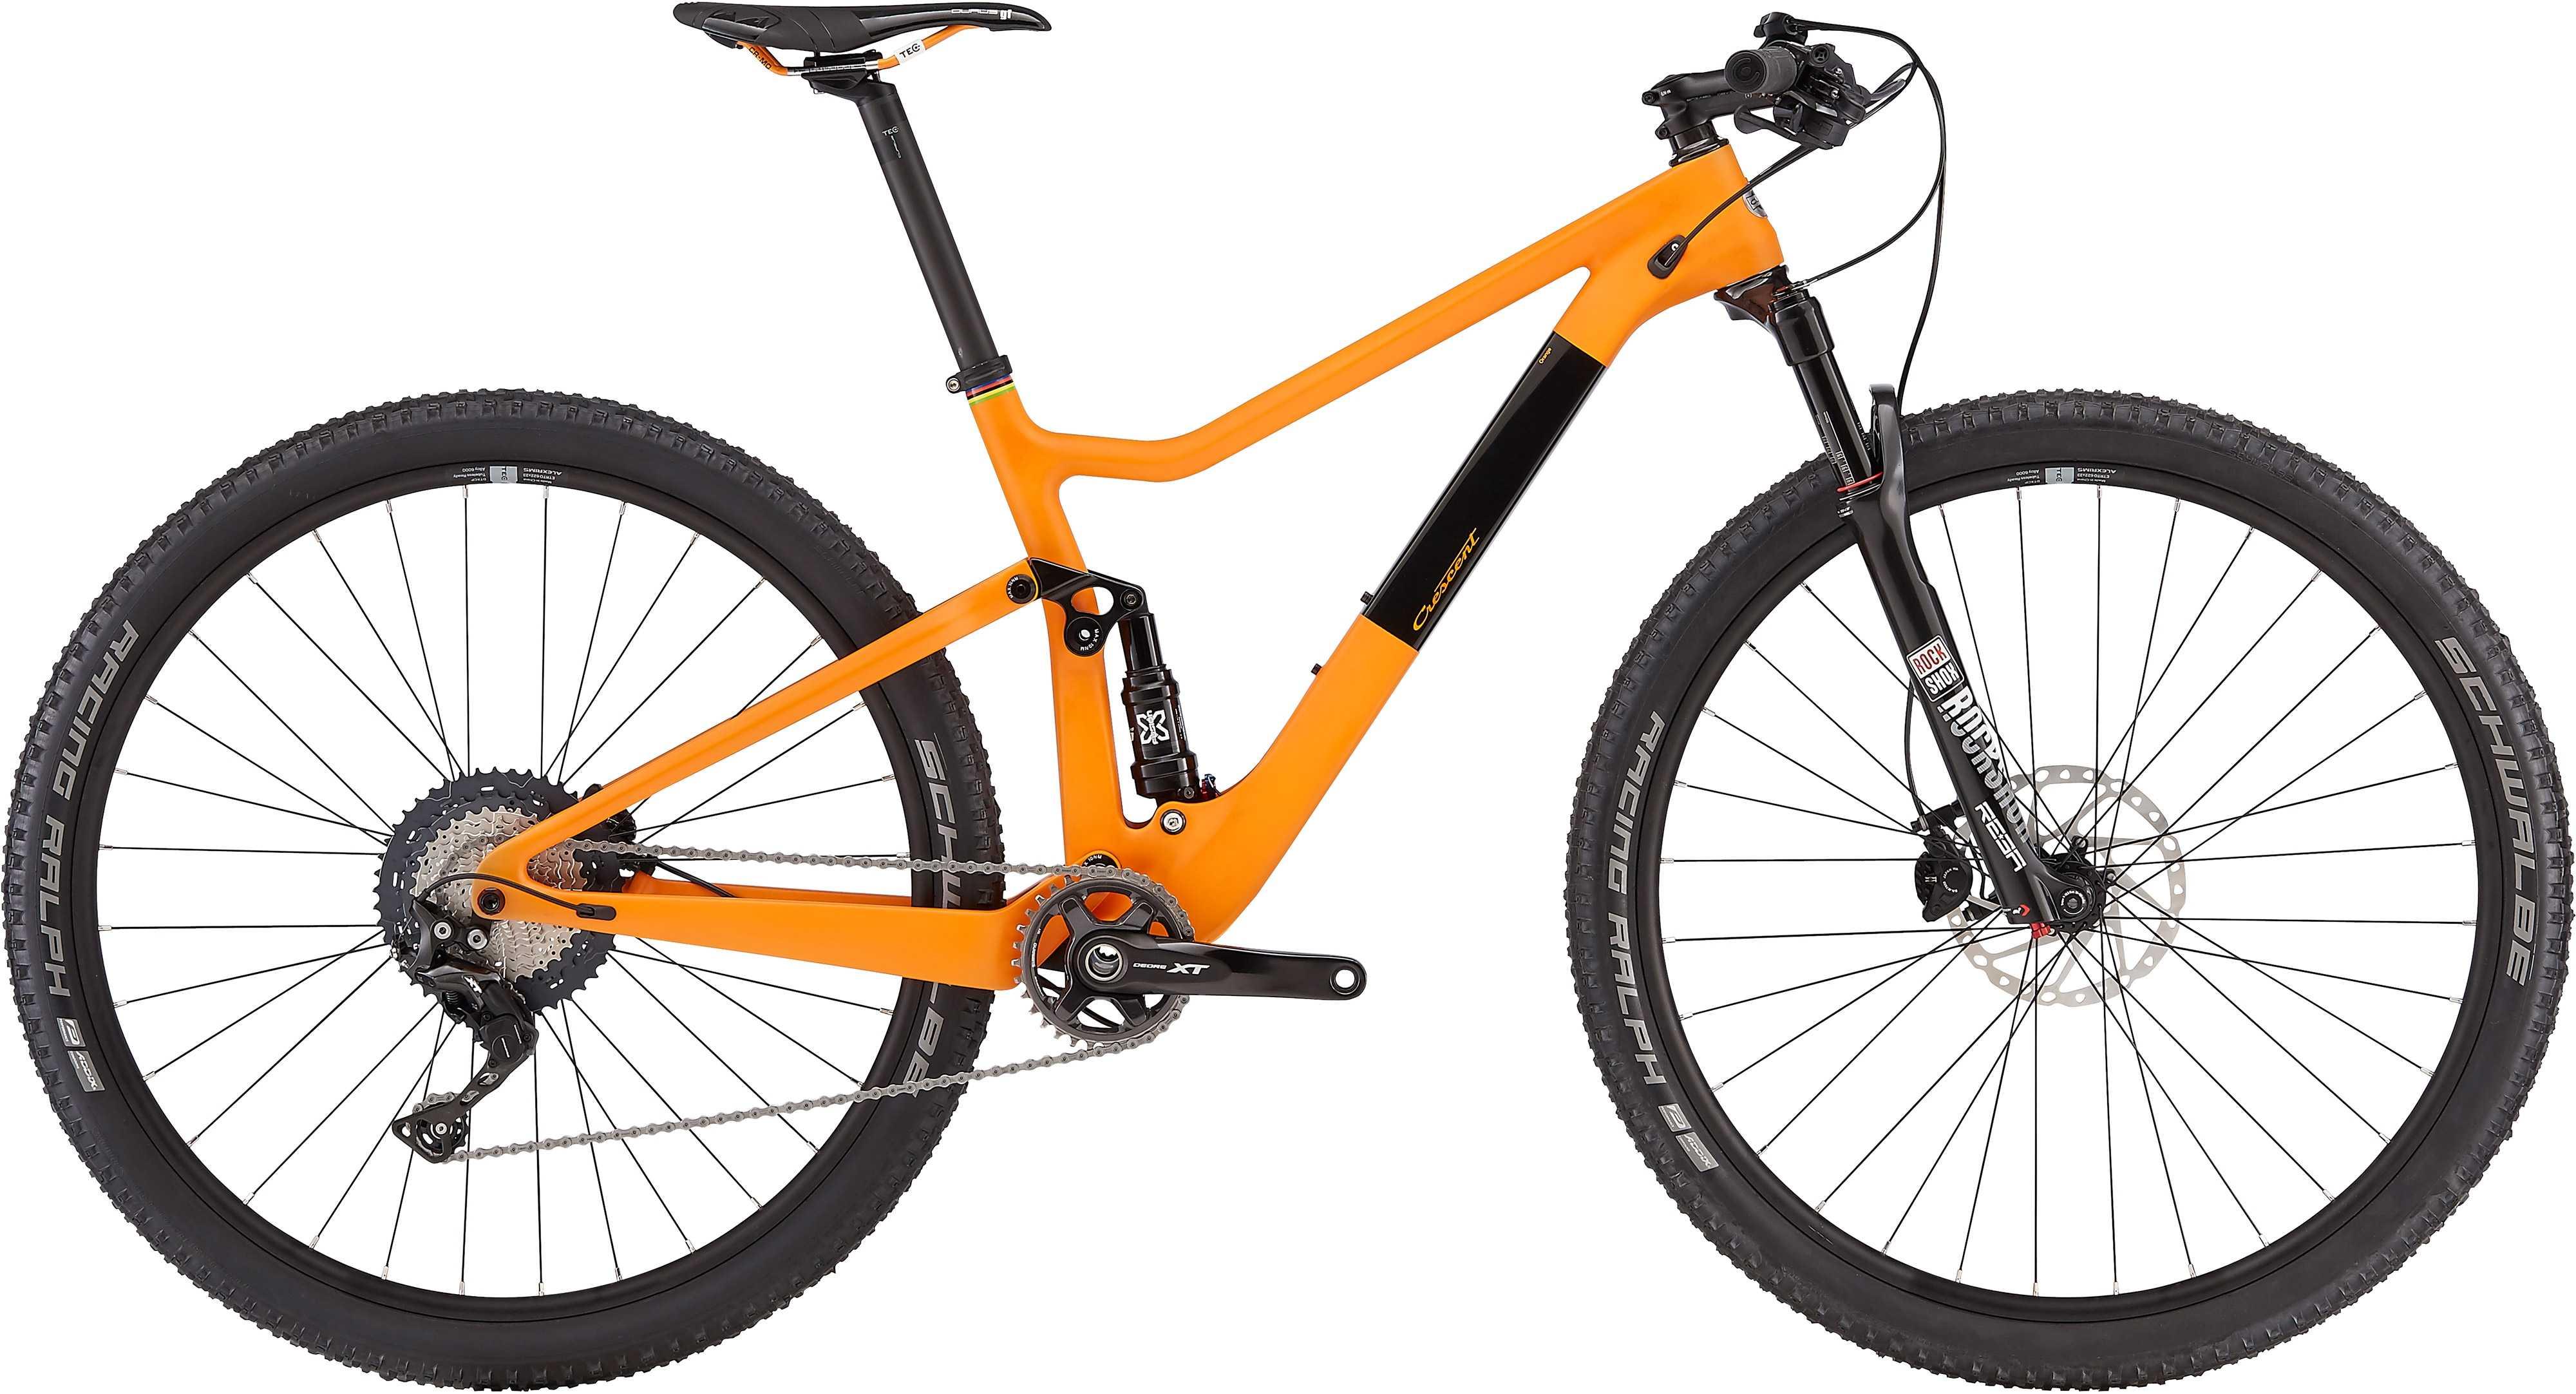 Crescent Stark S20 29 orange 49 cm